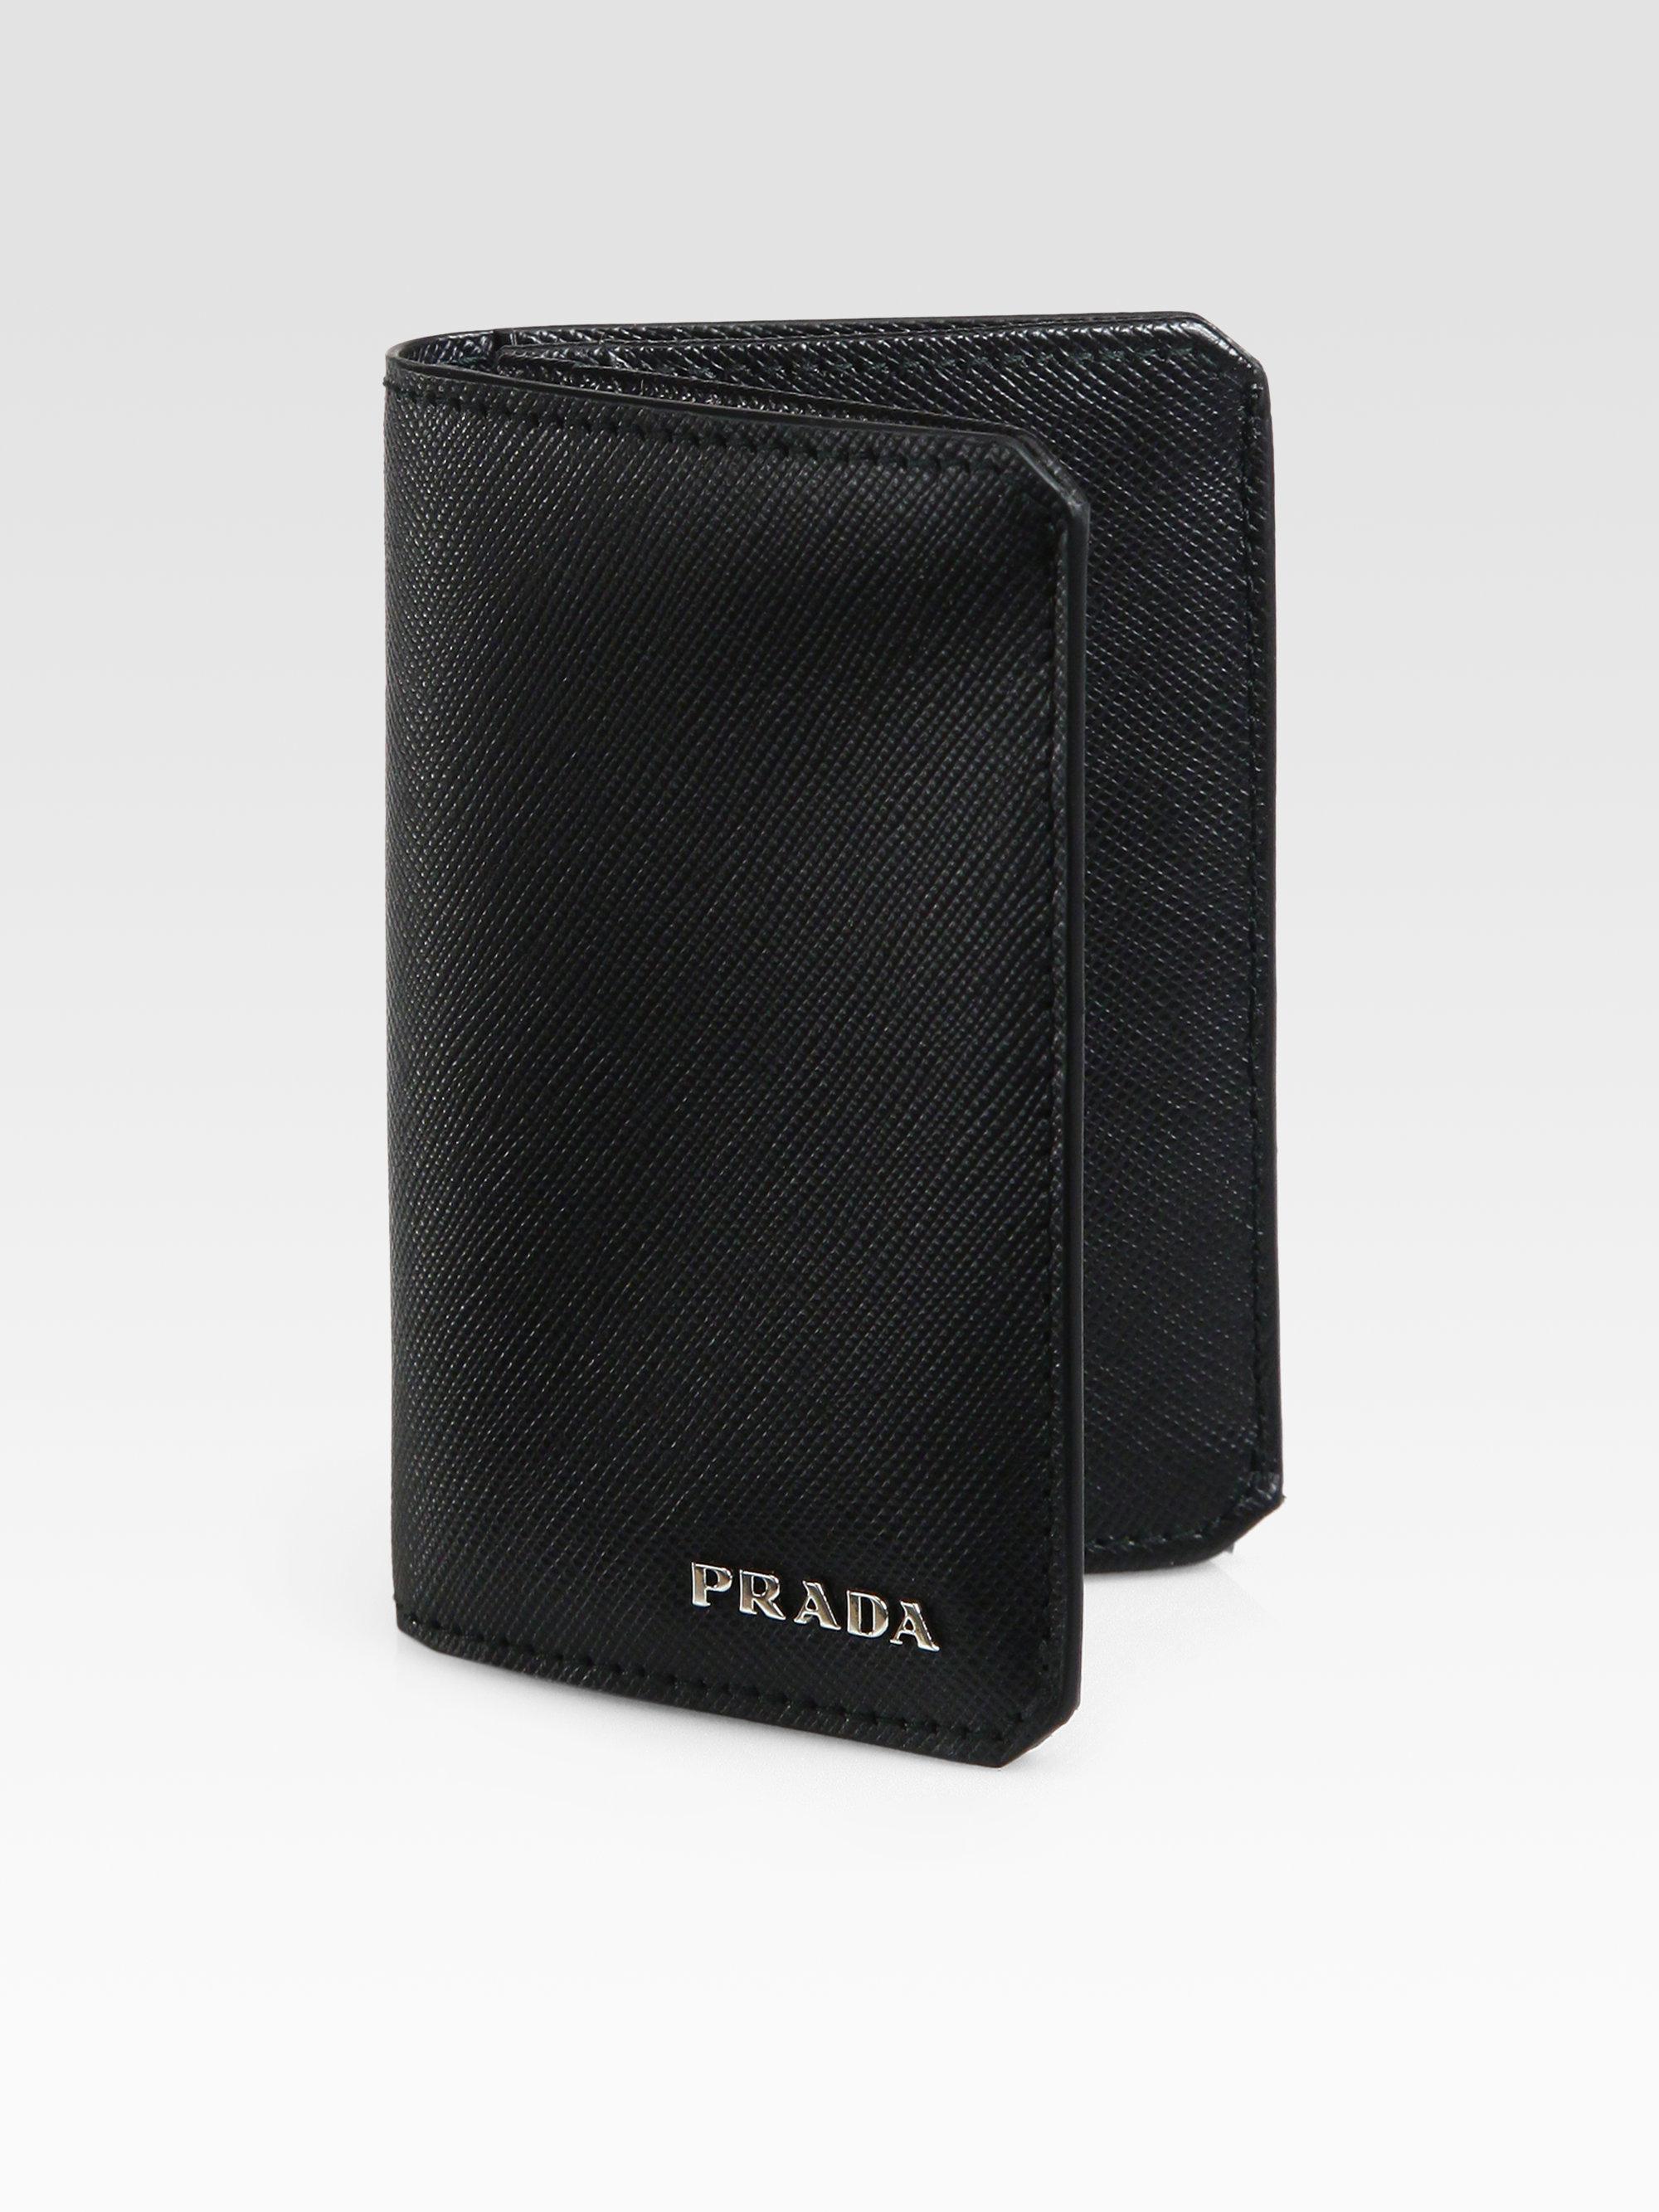 b2d19e2756ca5b Prada Saffiano Leather Credit Card Case in Black for Men - Lyst